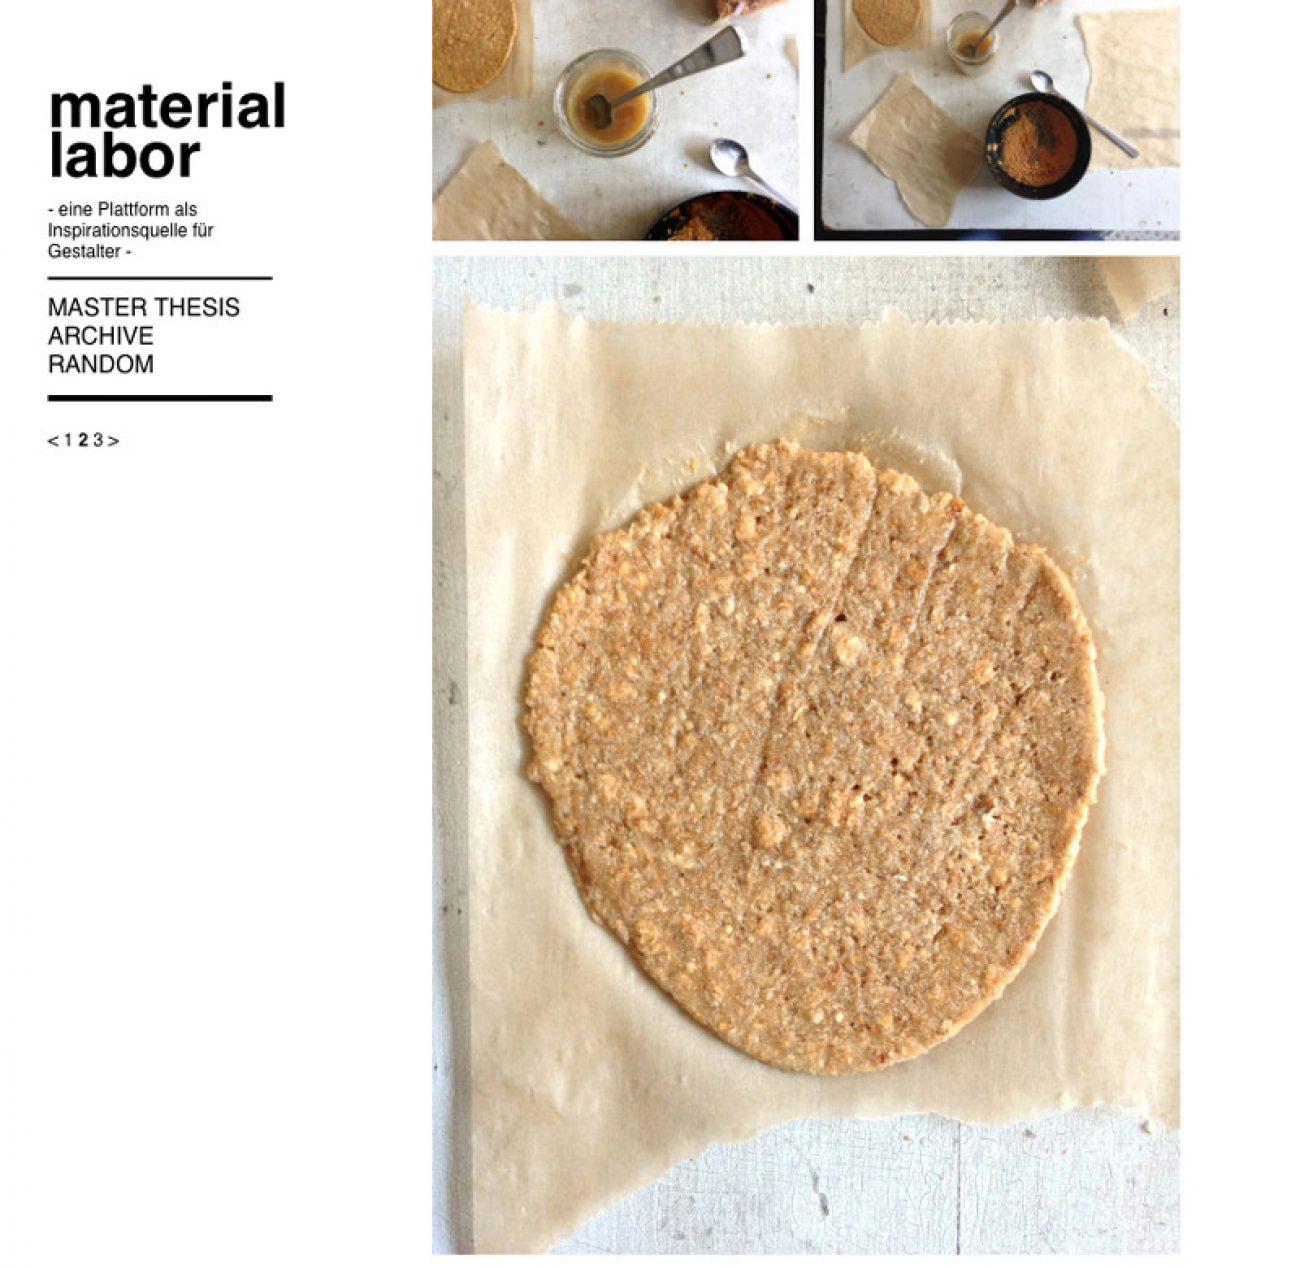 Katharina Berger «Was ist Material?» | Integrative Gestaltung Masterstudio, Diplom 2016